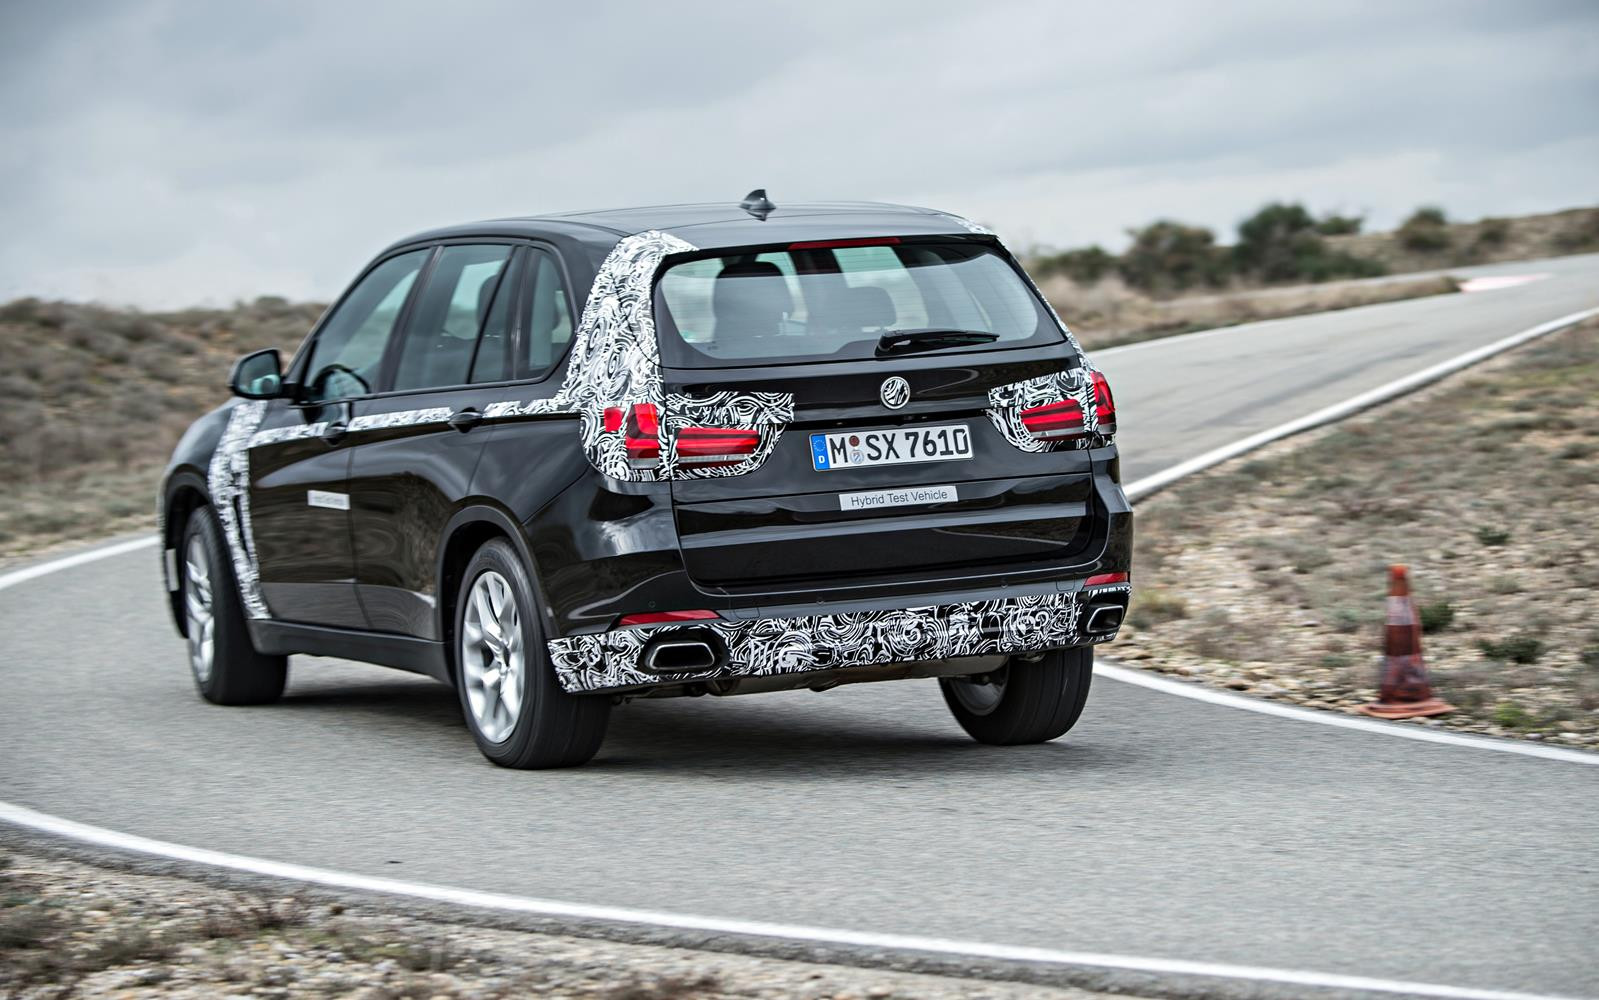 BMW X5 eDrive PHEV Prototype 2014 Rear Left Cornering FrontSeatDriver.co.uk